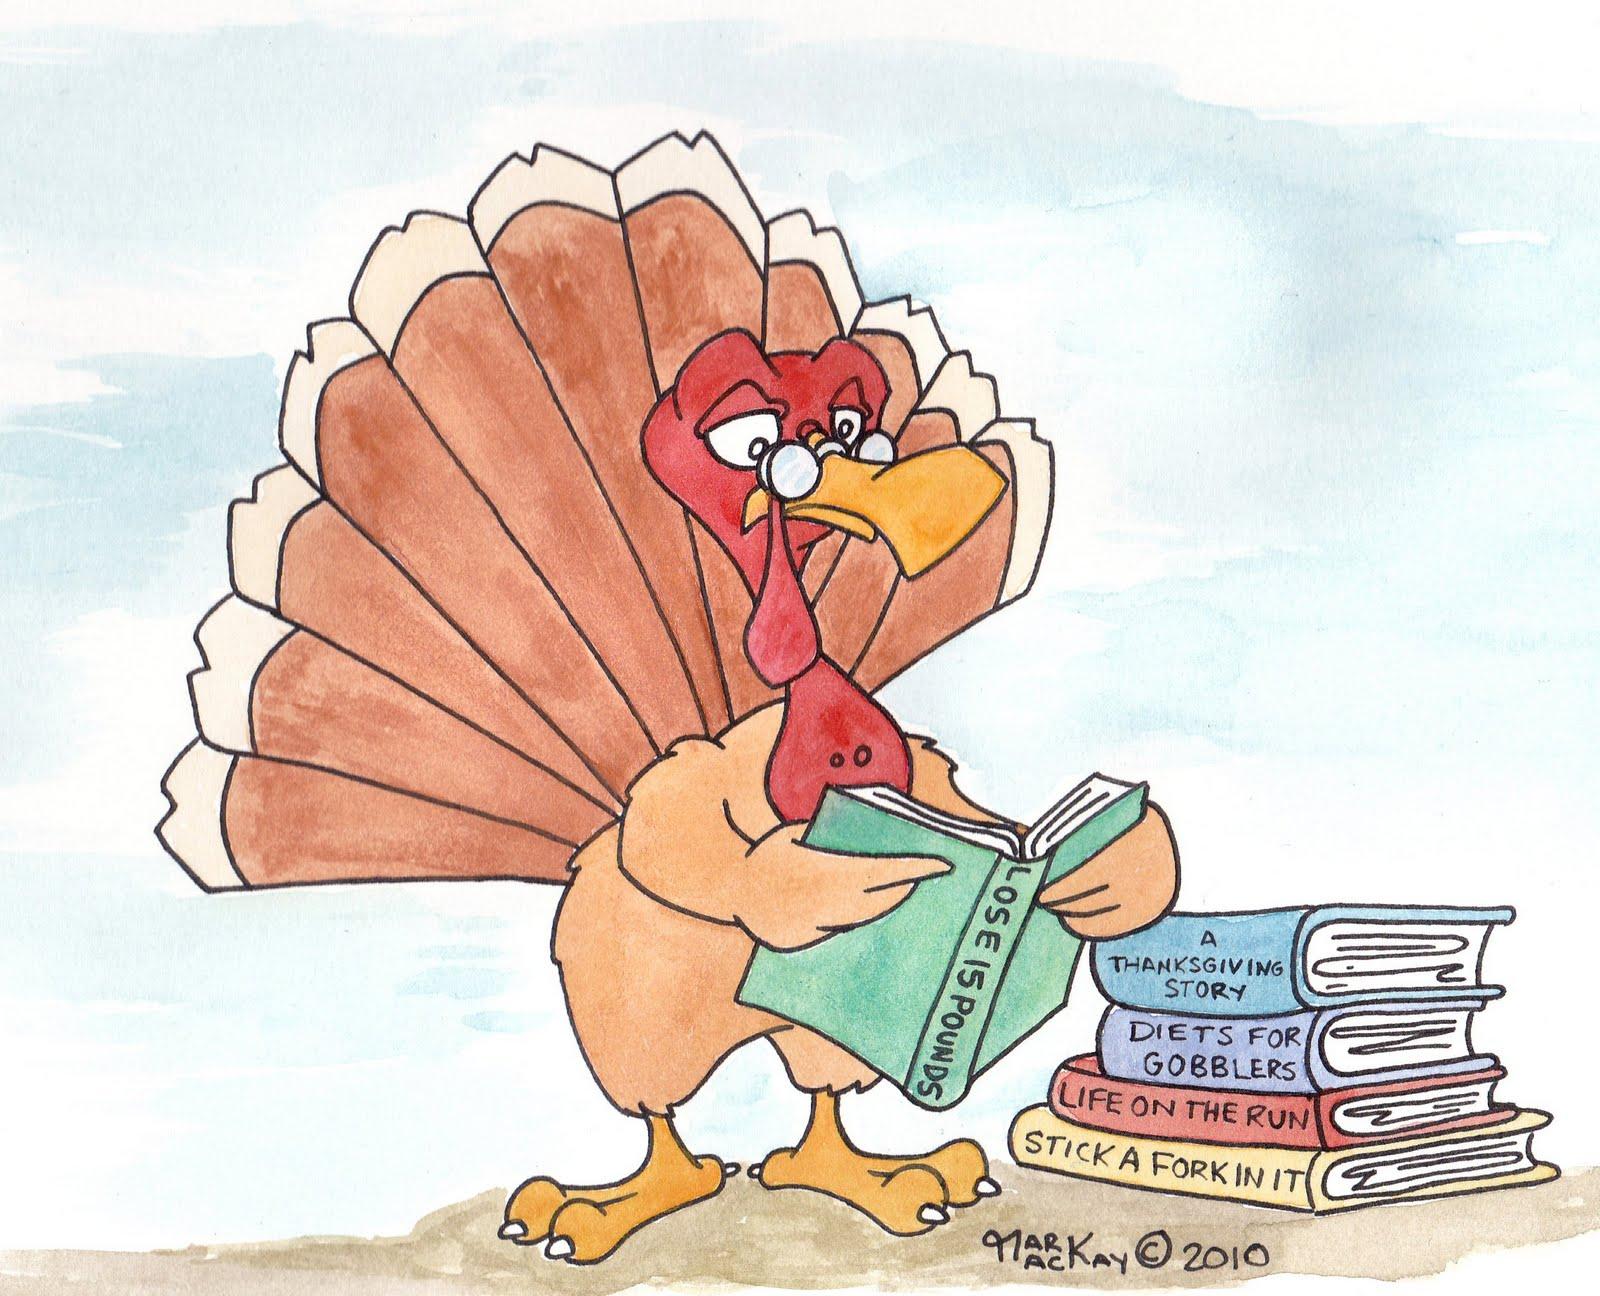 turkeyreading